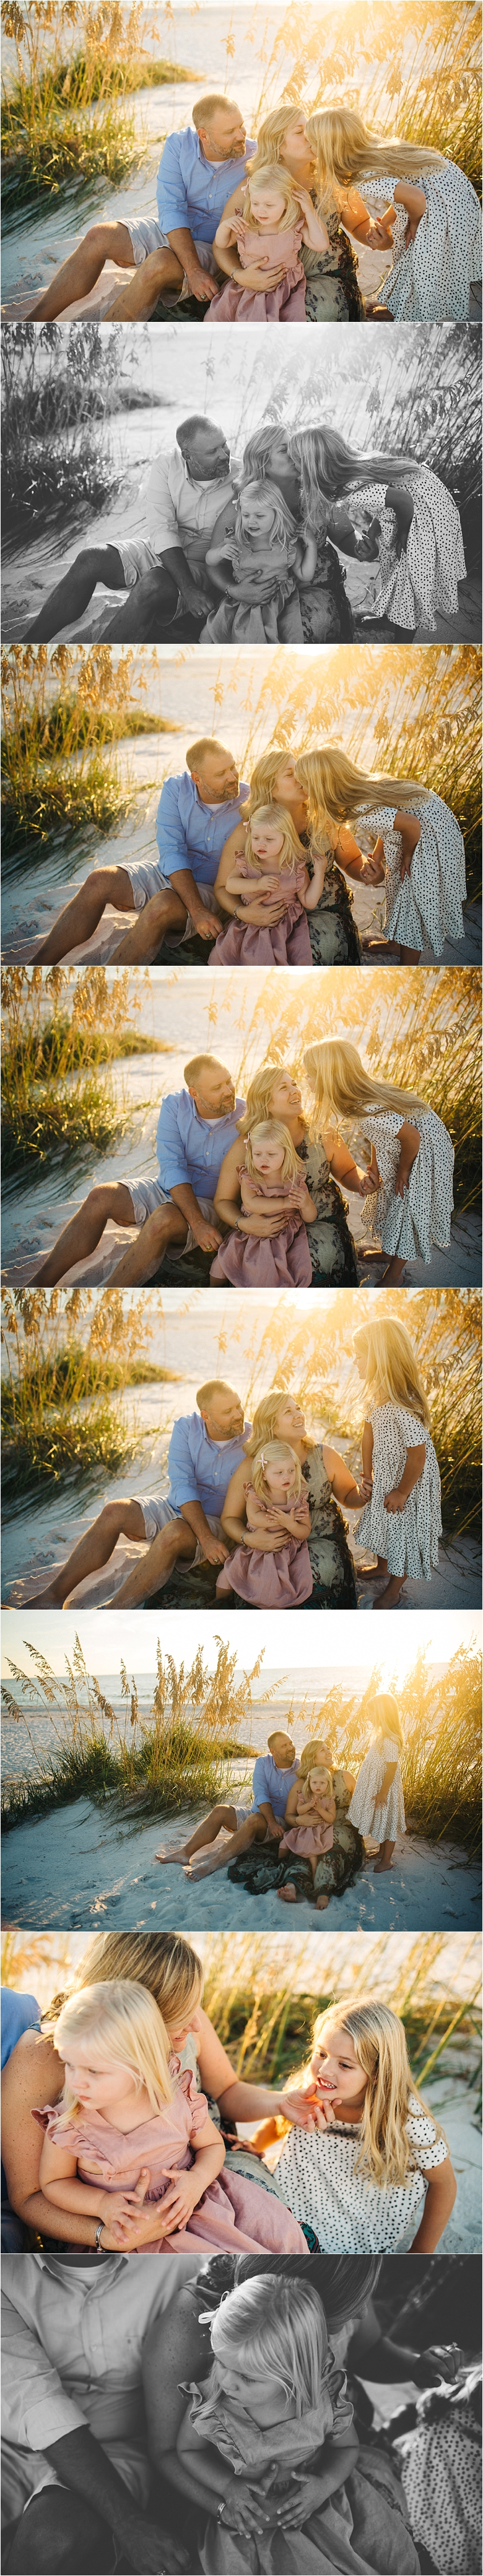 kansascityfamilyphotographer_0009